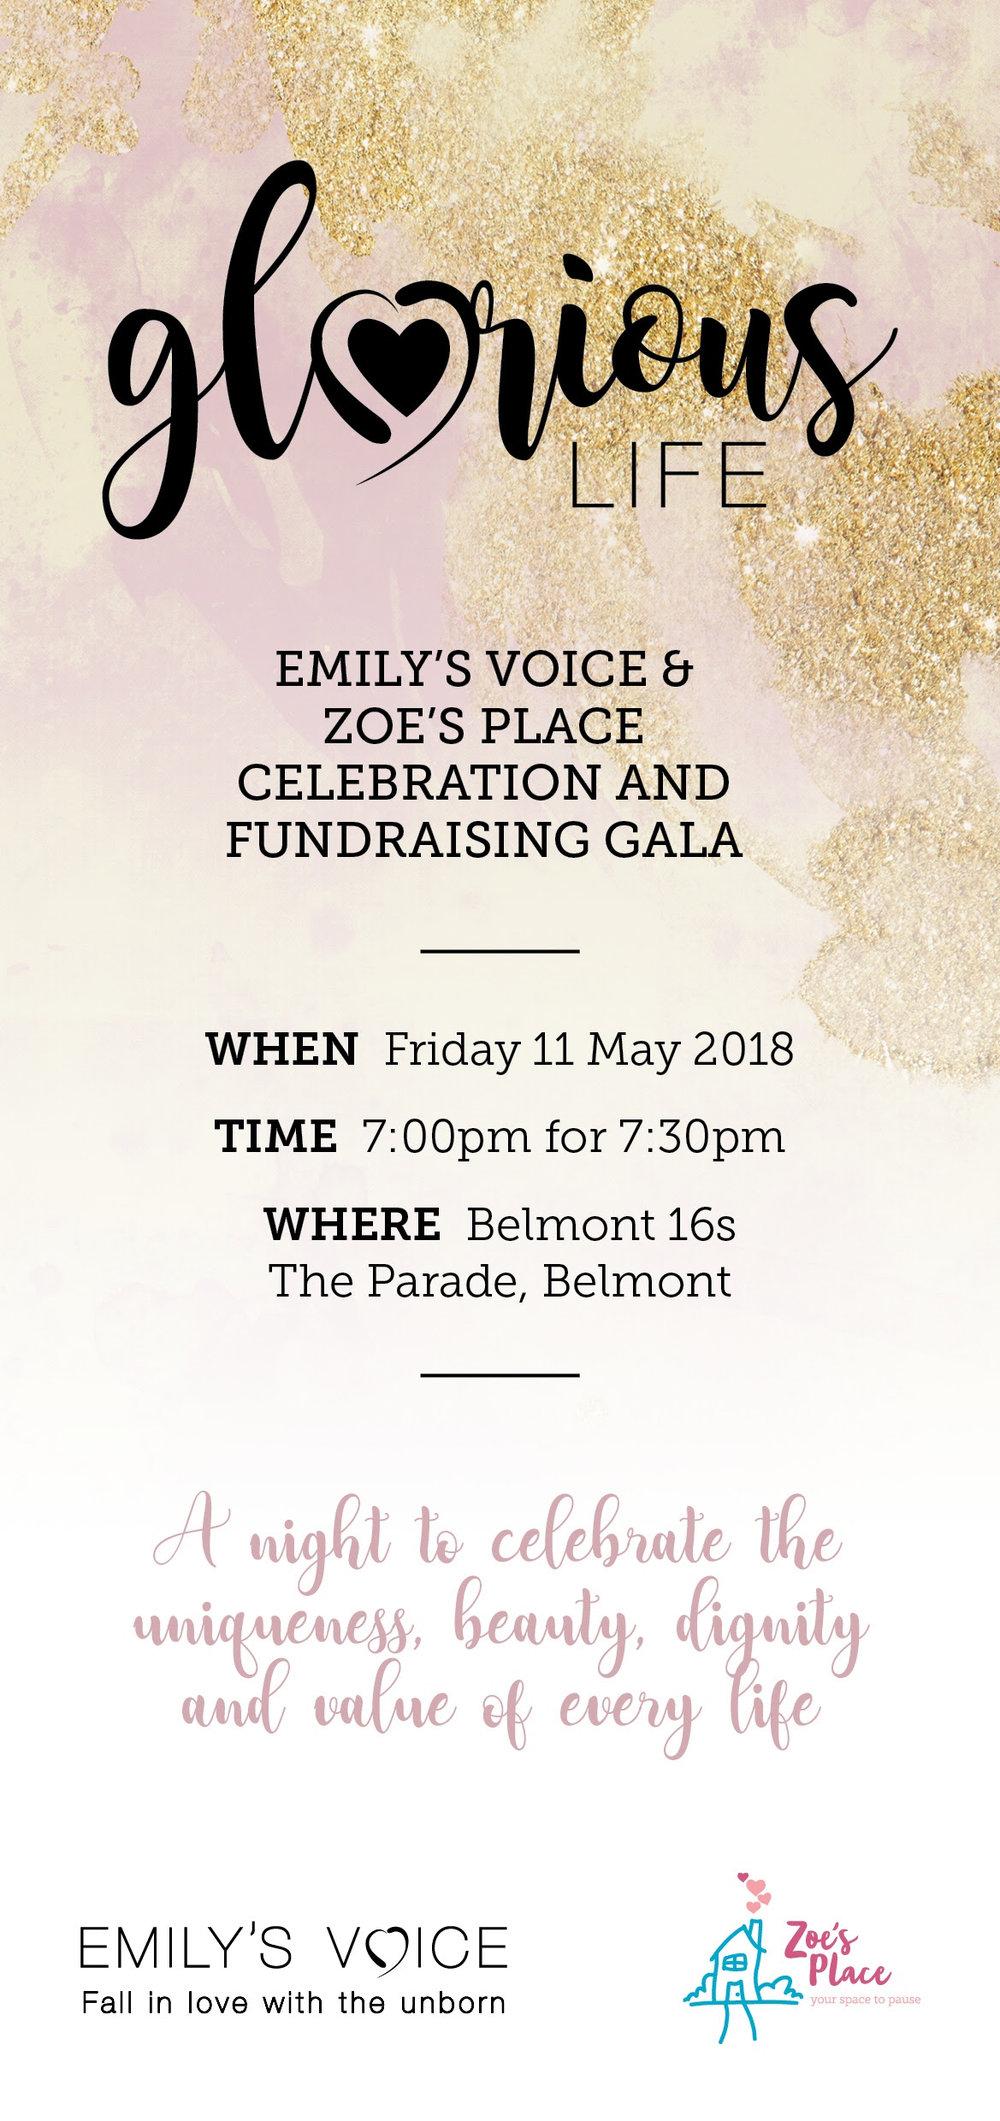 emily's voice invite.jpg